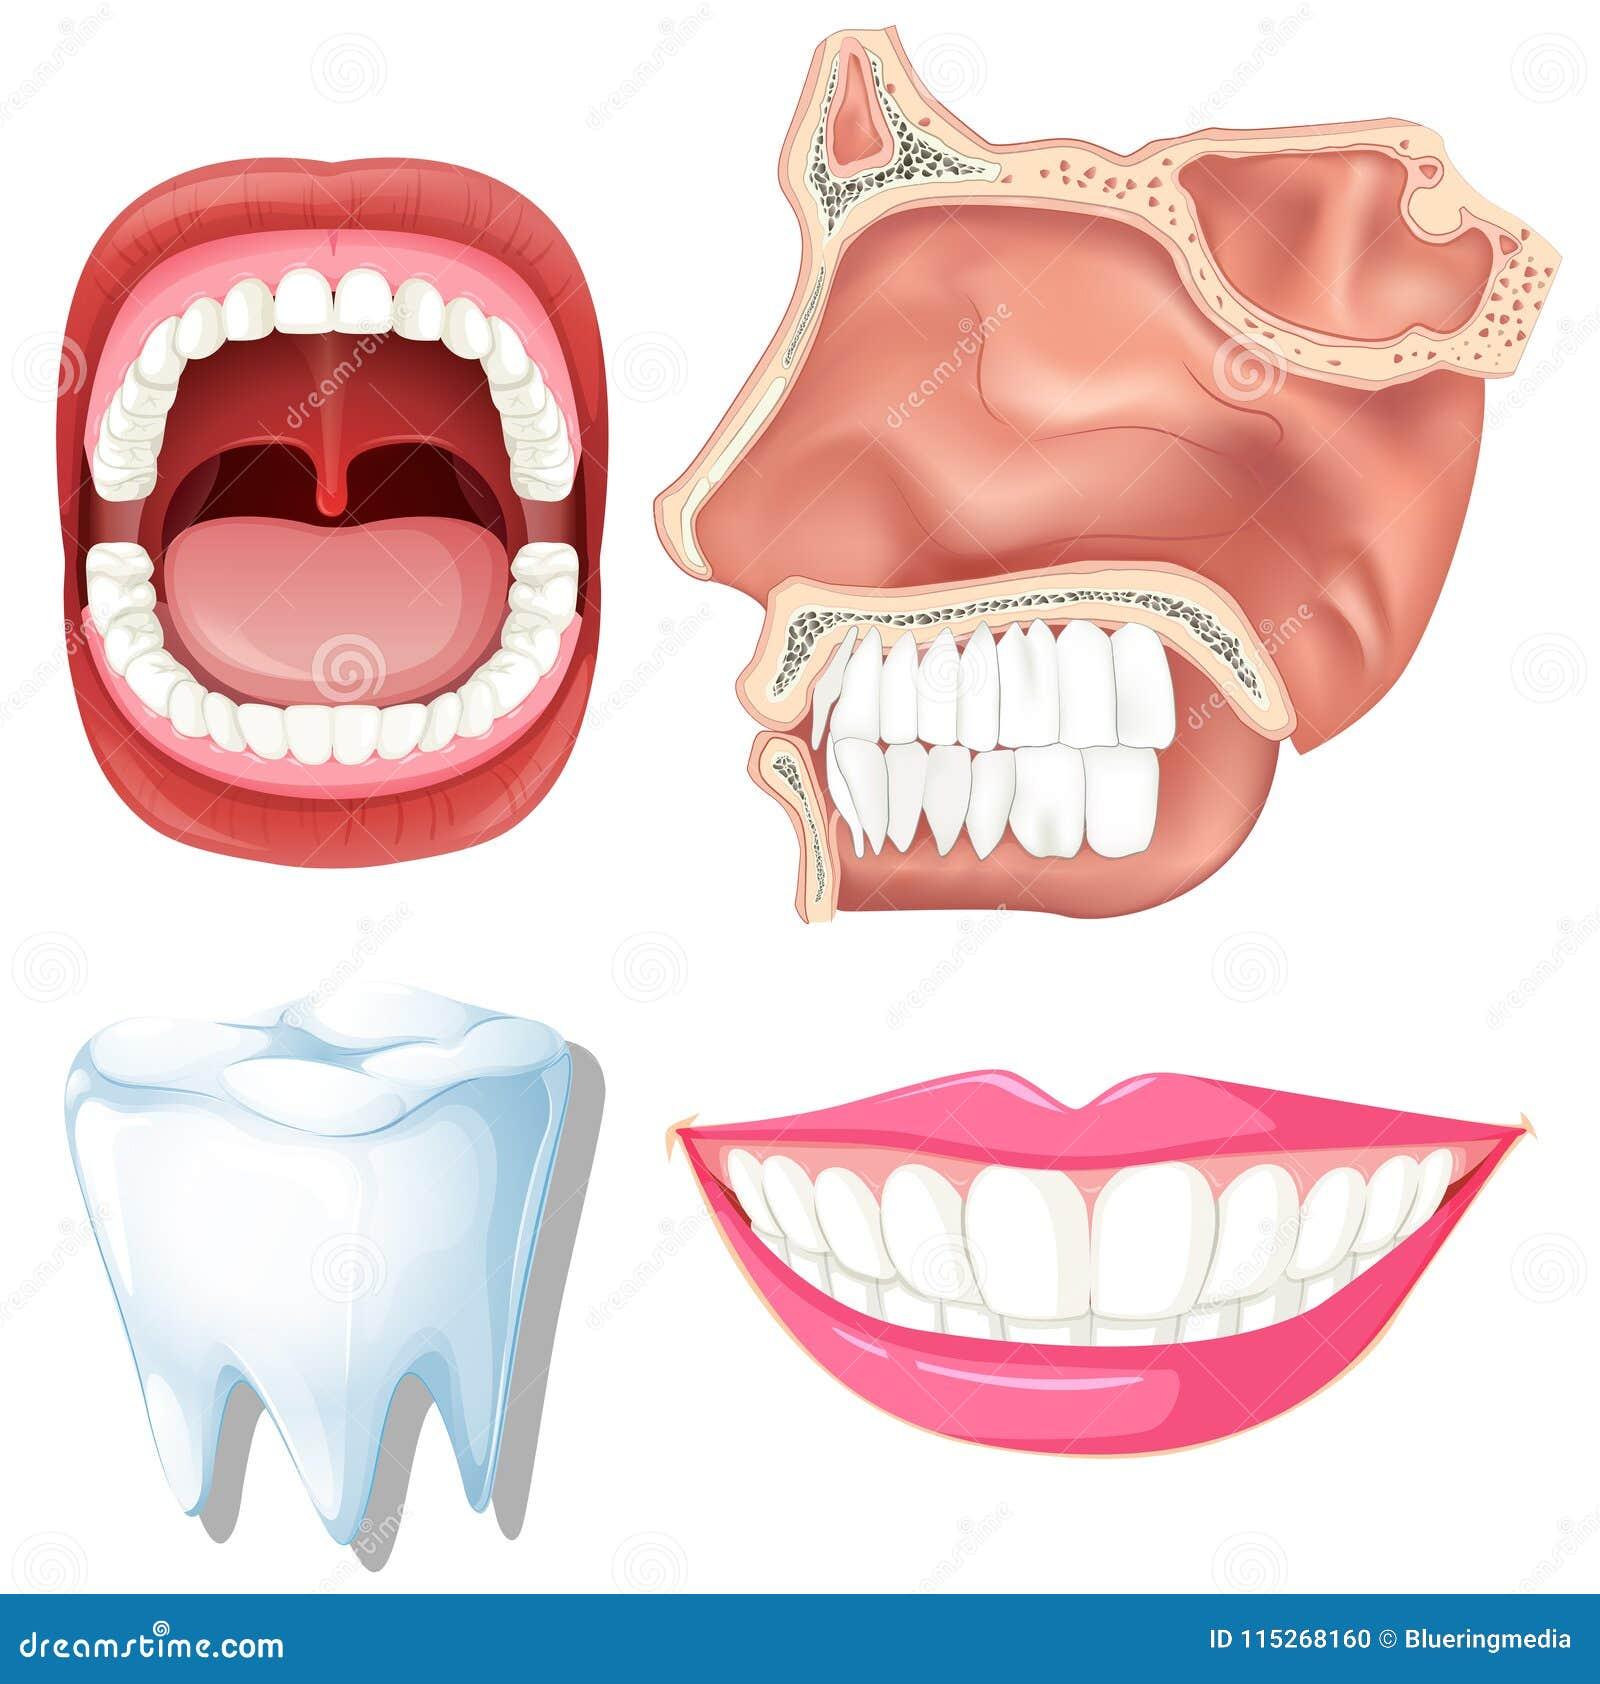 Anatomy Of Human Teeth Stock Vector Illustration Of Drawing 115268160